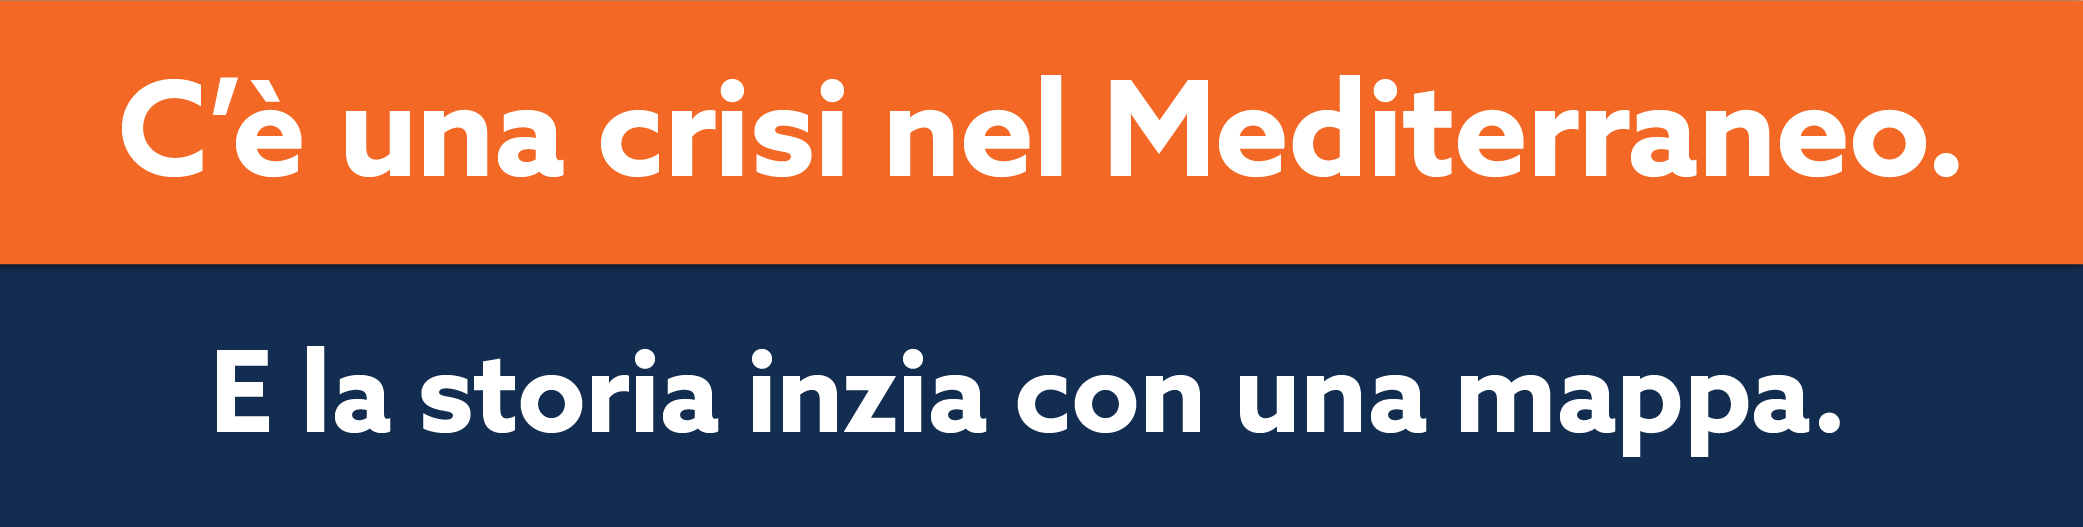 ITALIAN_Migrants_Organized_Part1-01.png